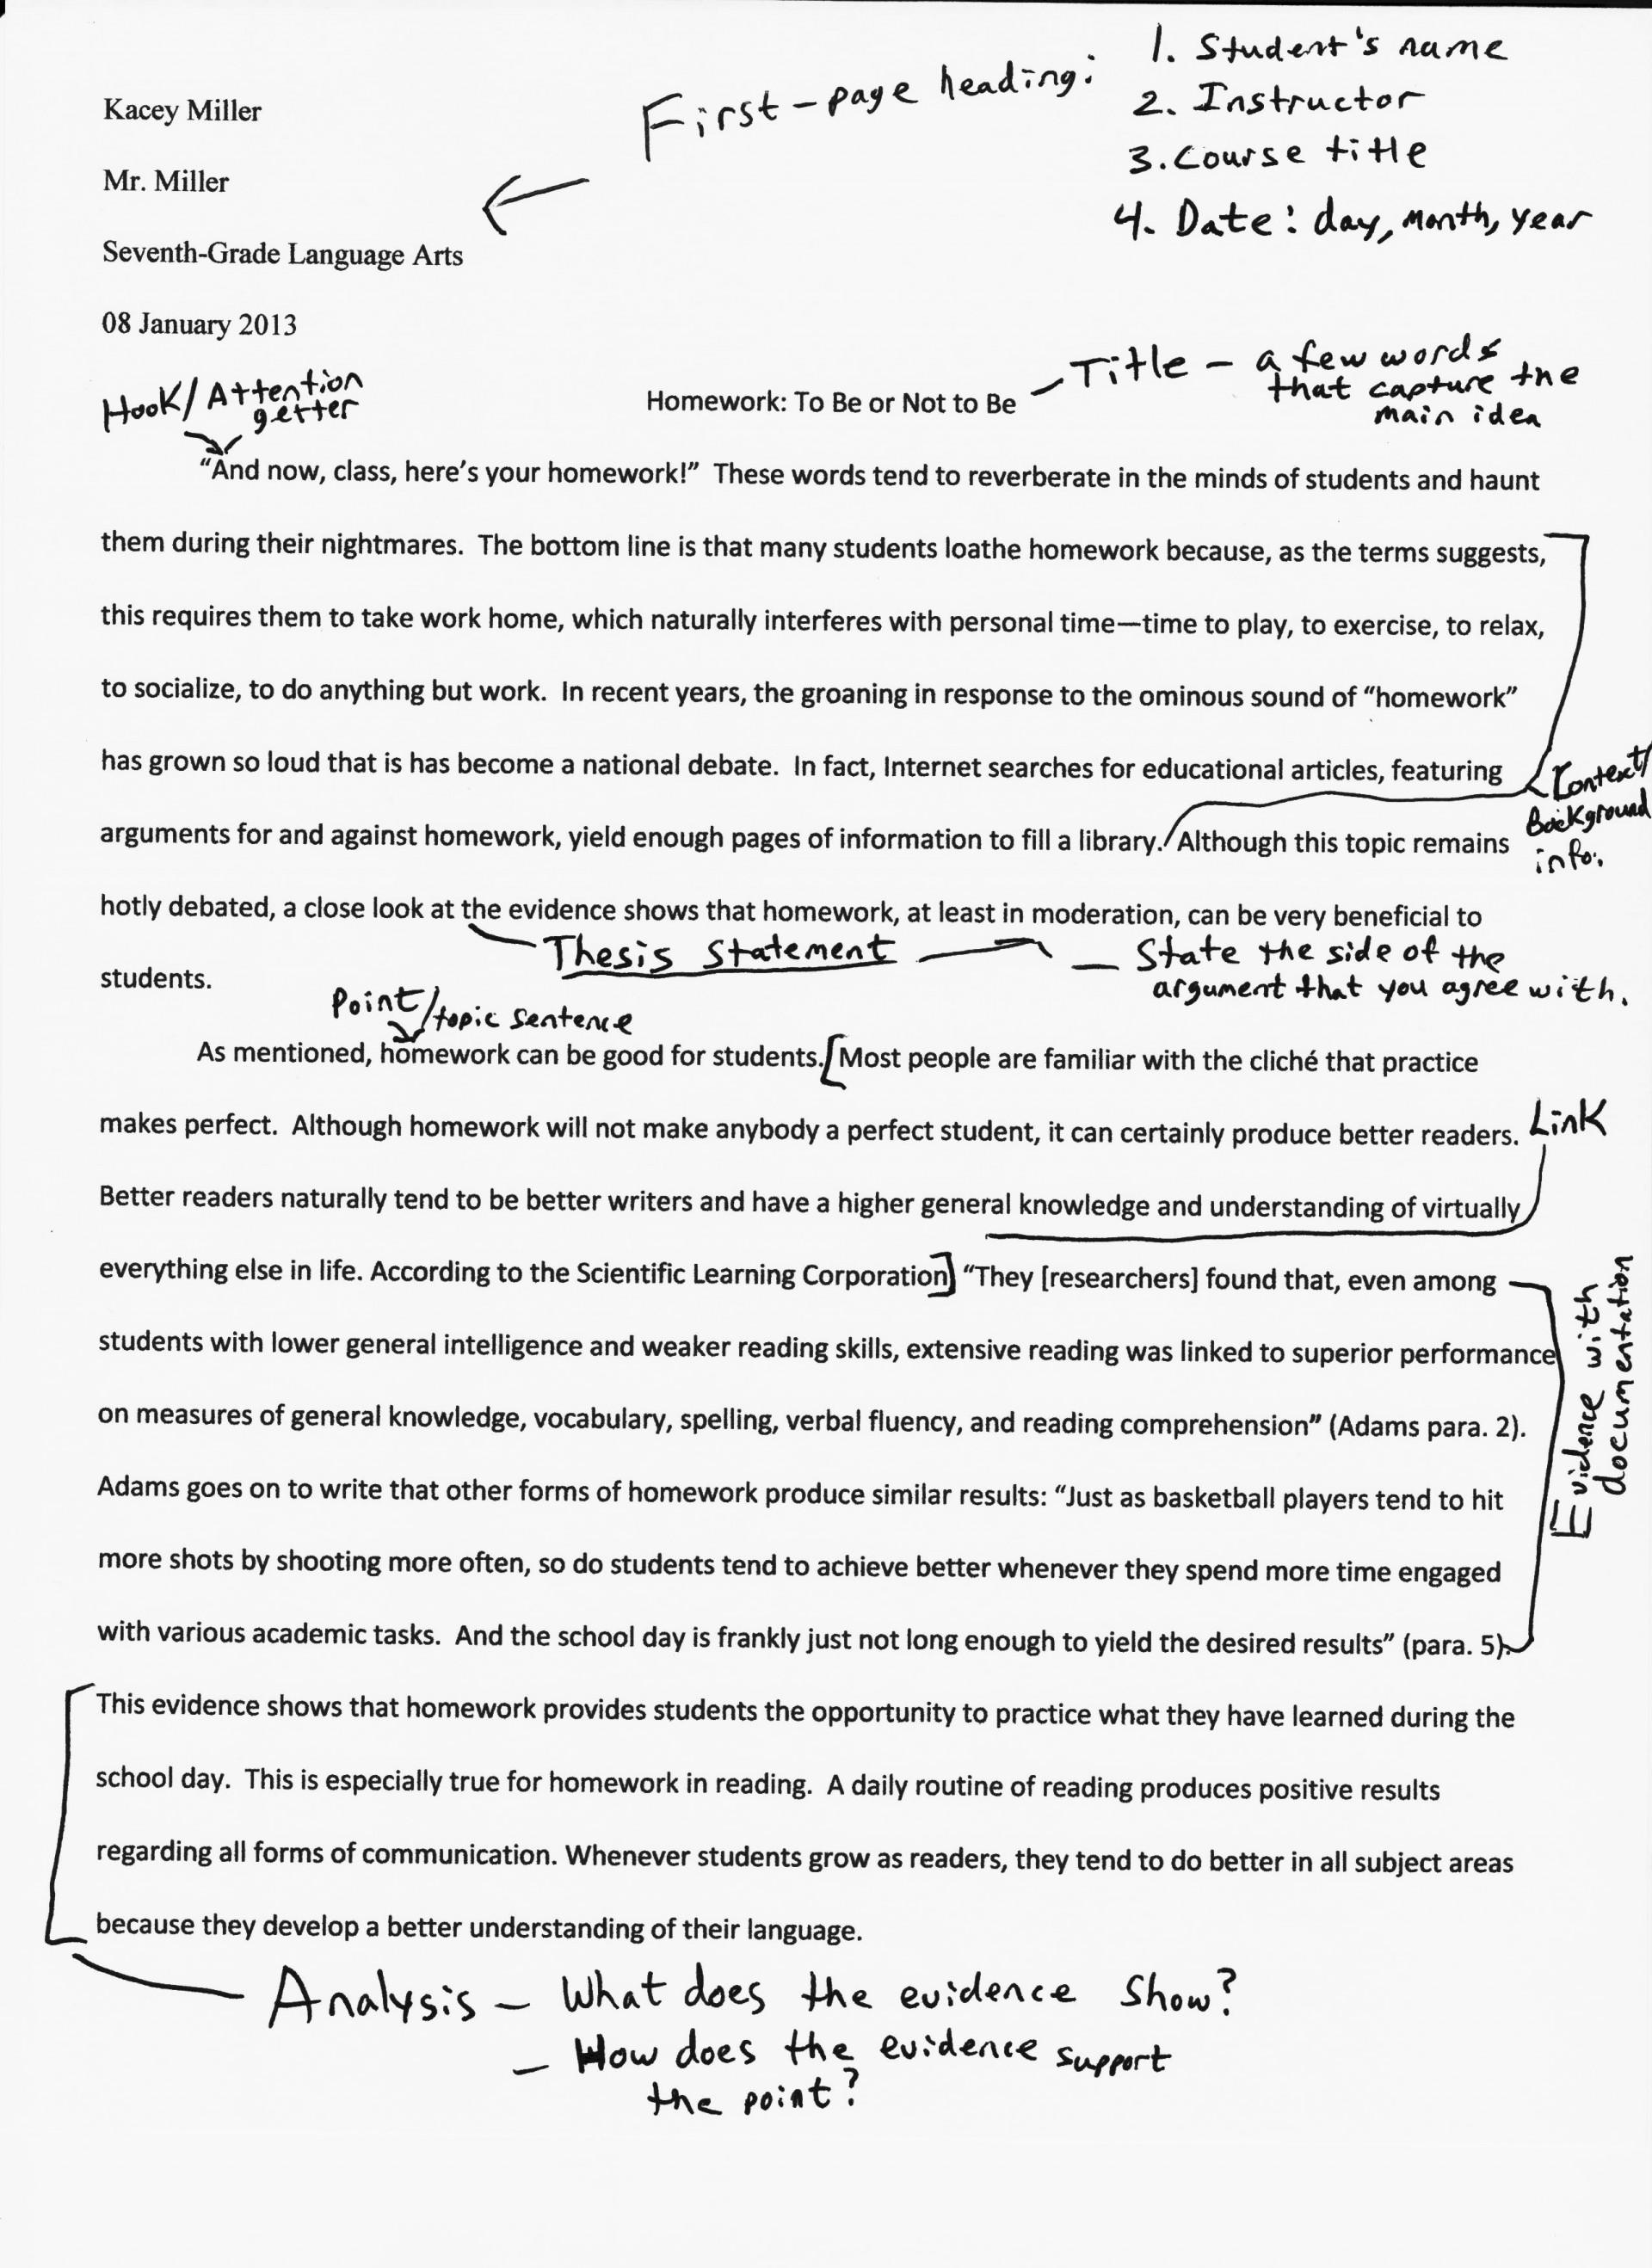 012 Essay Example Mentor20argument20essay20page20120001 Pro Death Fearsome Penalty Con Debate Argumentative Outline 1920